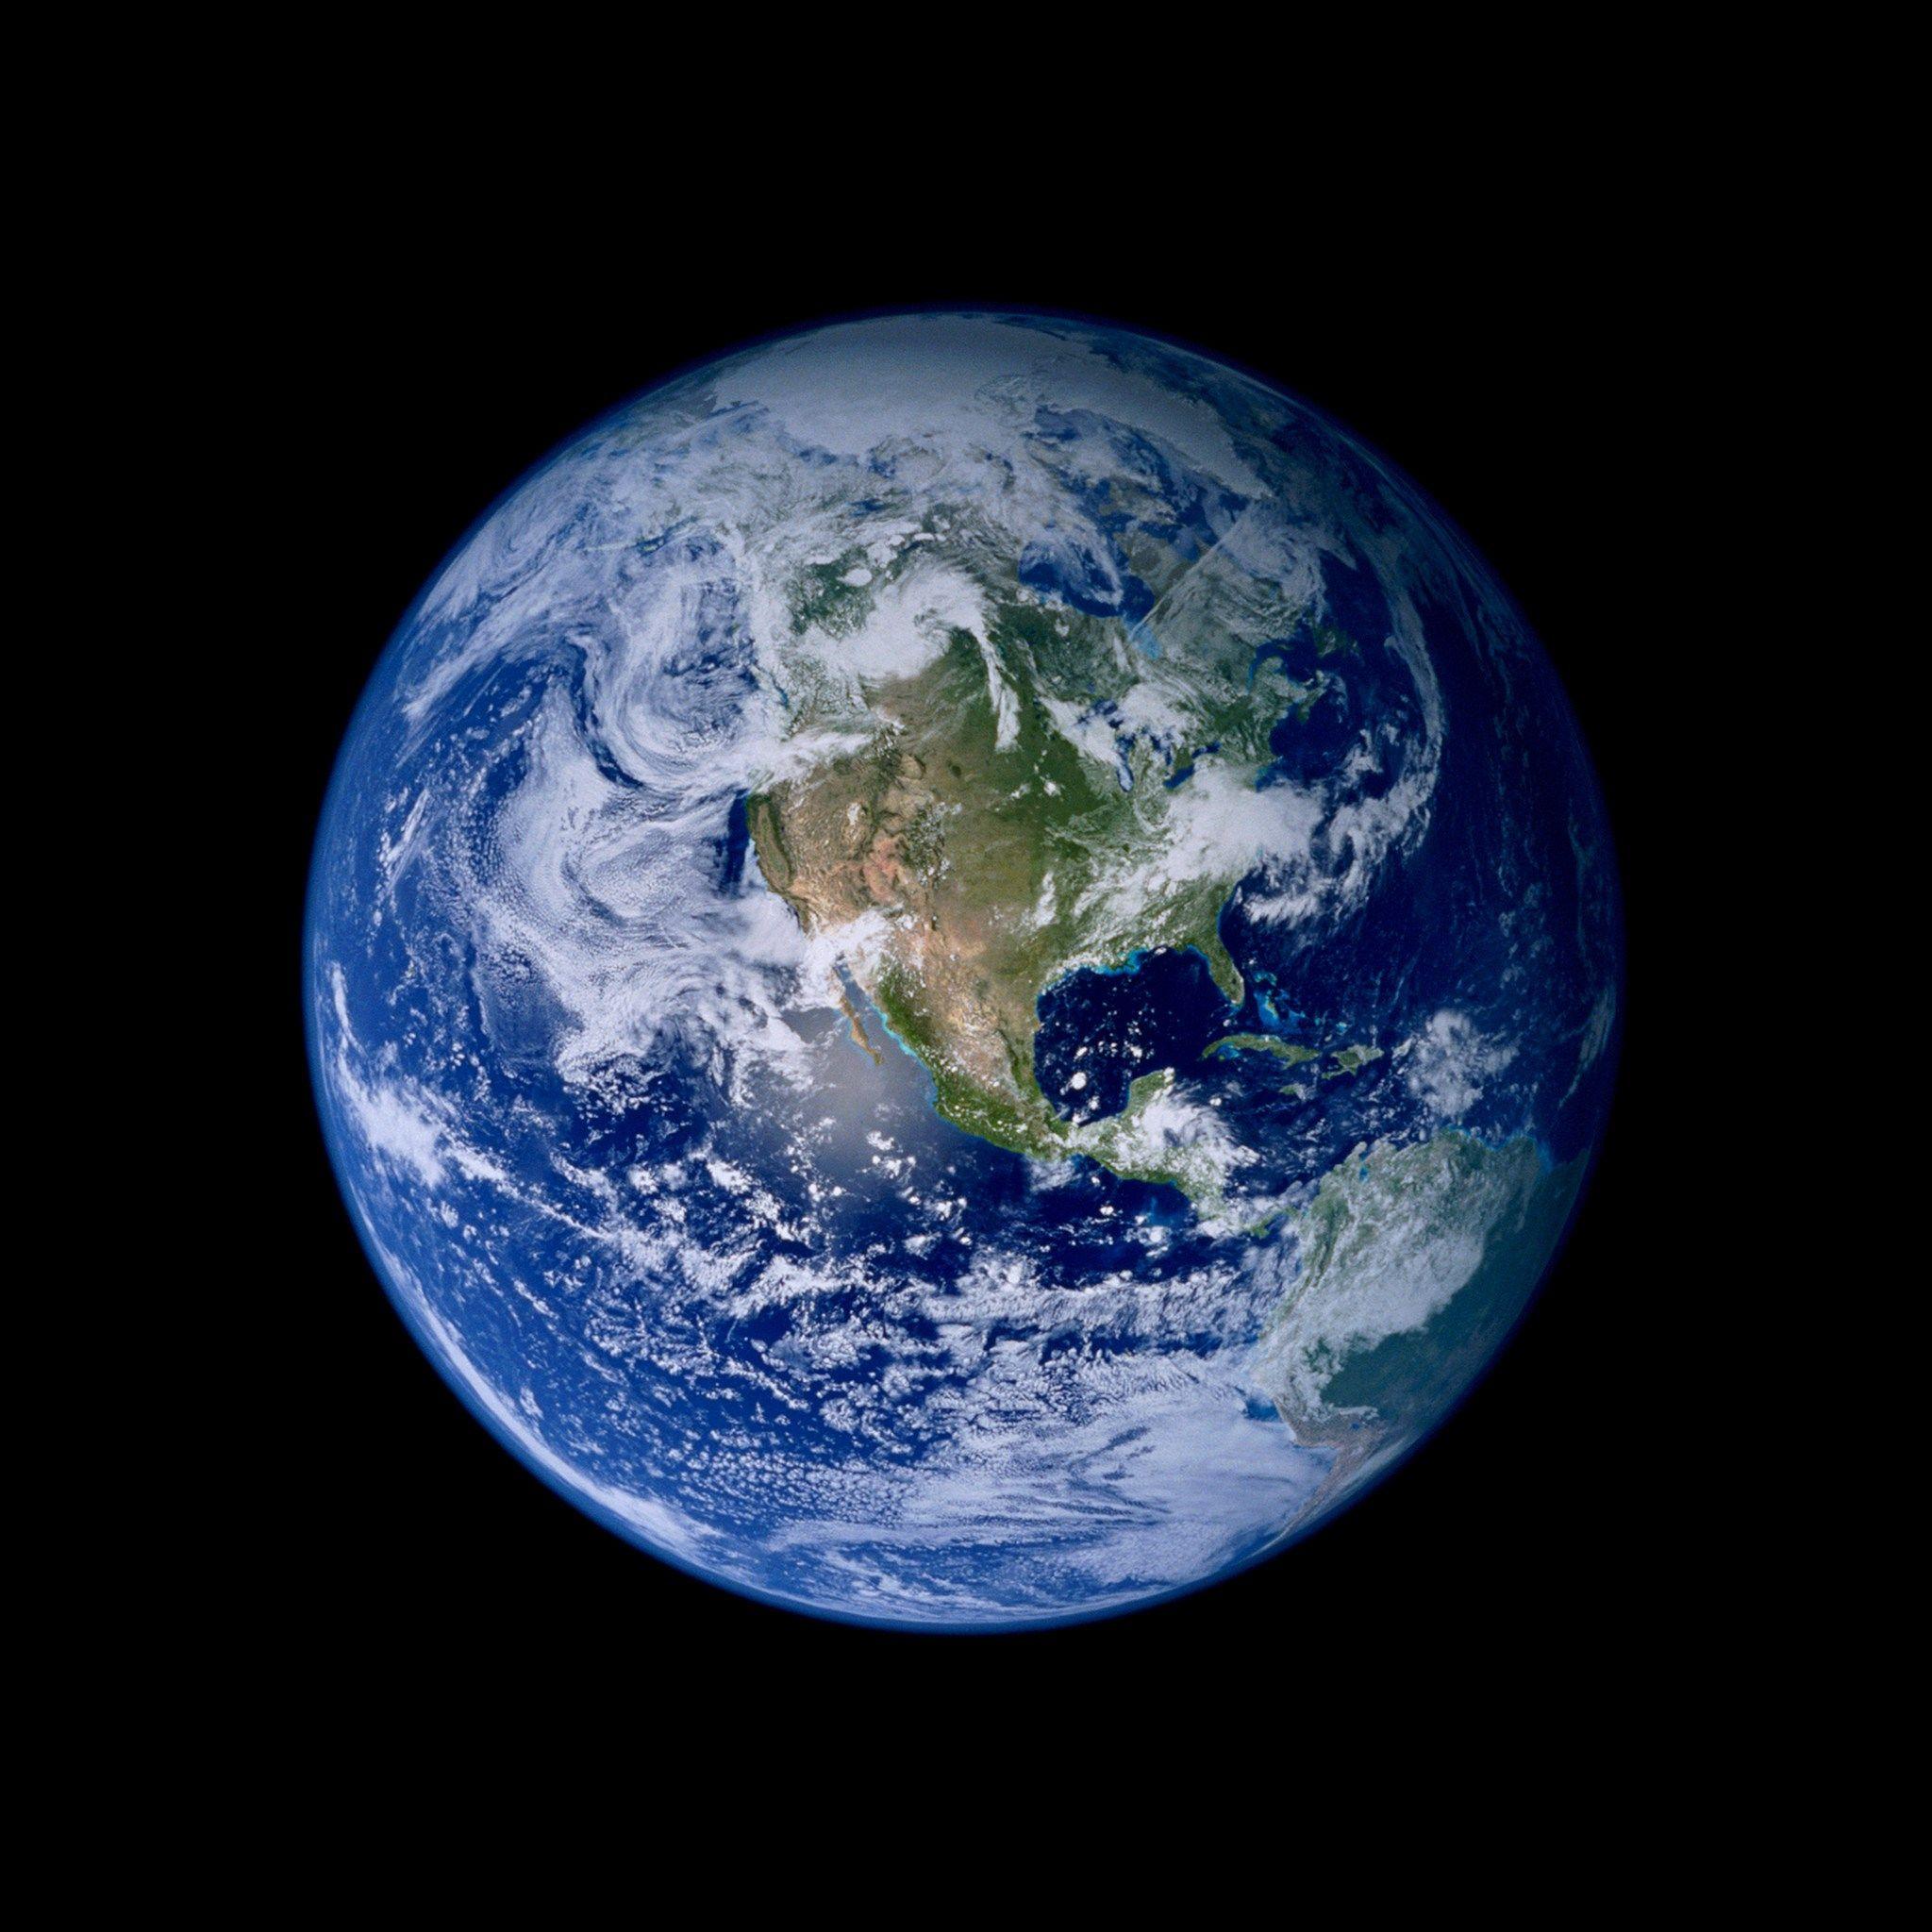 Pin By Joseph Ramiro Macias Perez On Planet Earth Planet Earth